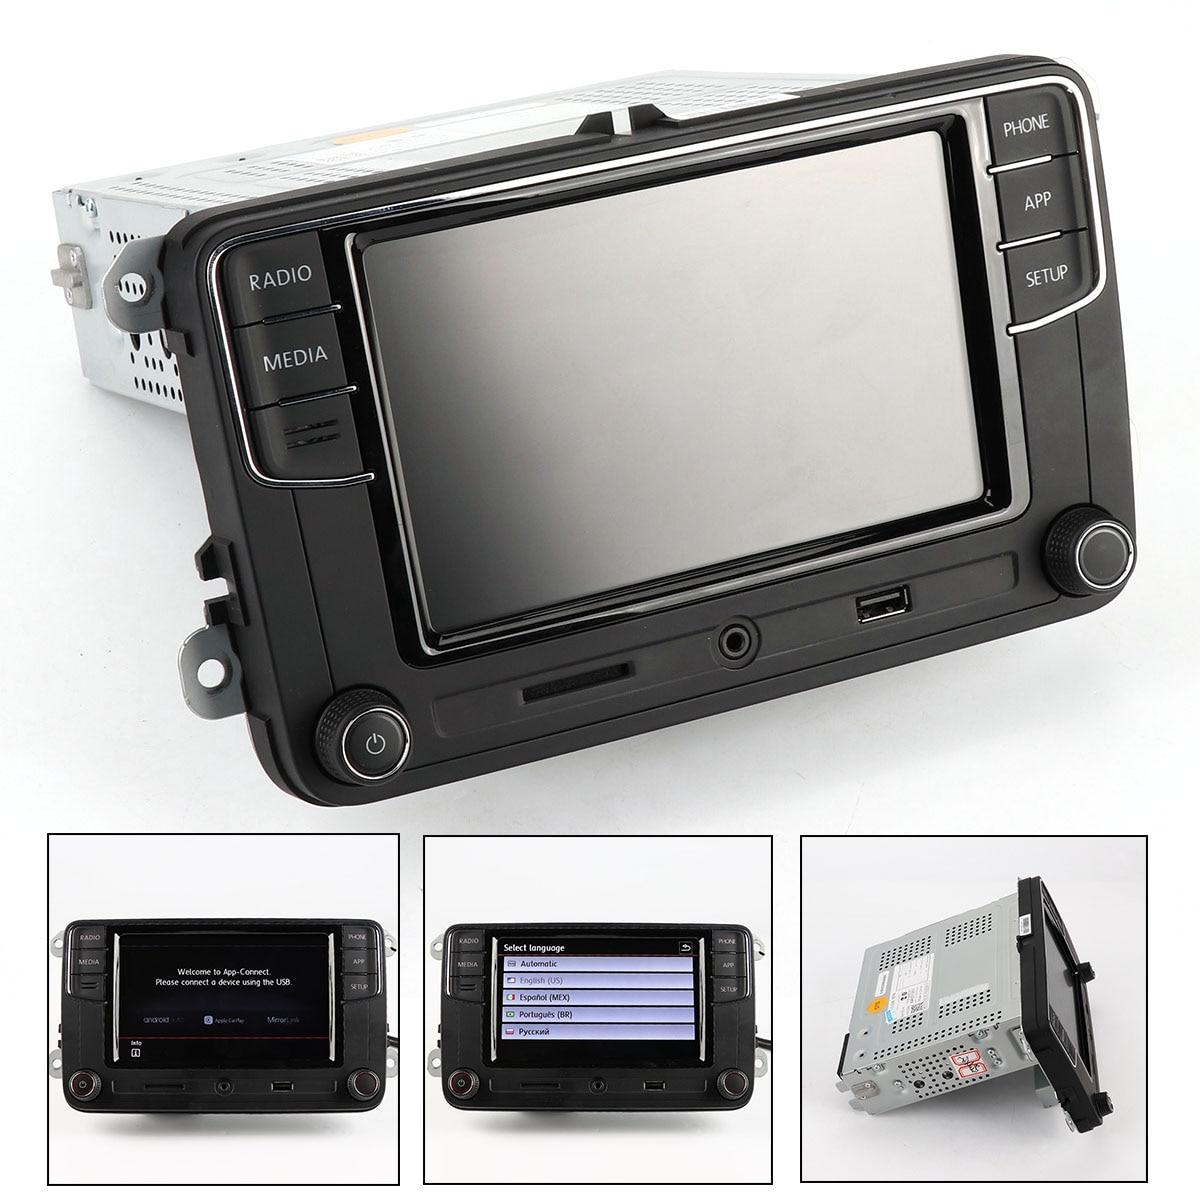 6.5'MIB Carplay Android Auto Noname Radio RCD340G For VW Tiguan Golf 5 6 MK5 MK6 Passat Polo 6RD 035 187 B 6RD035187B